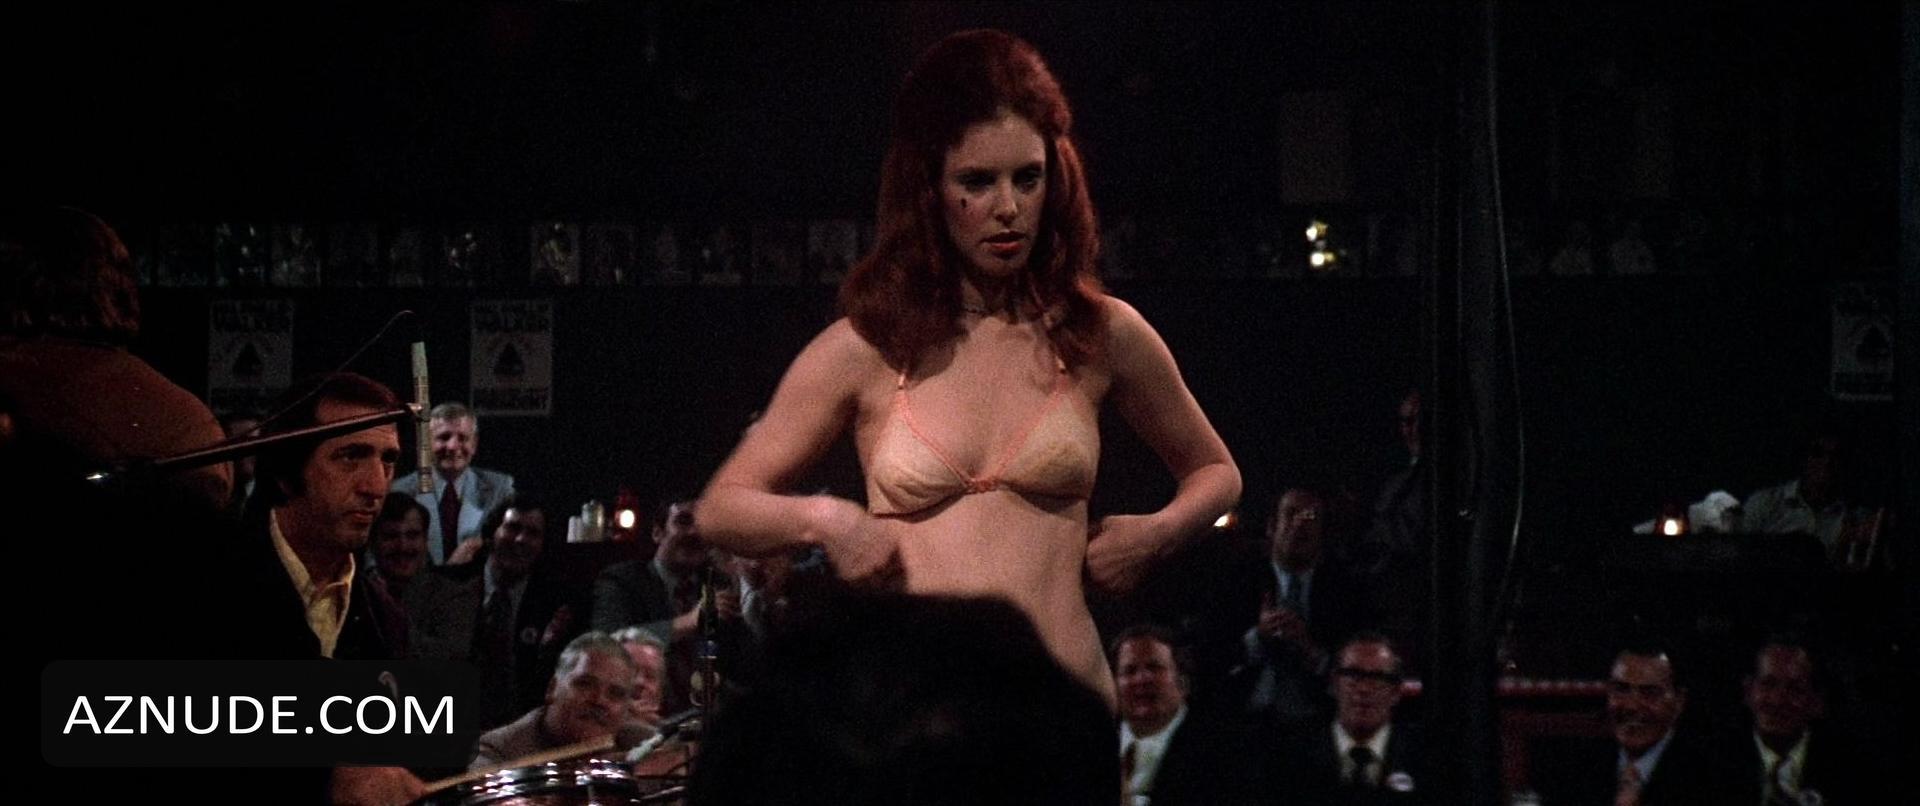 Lara clifton principles of lust